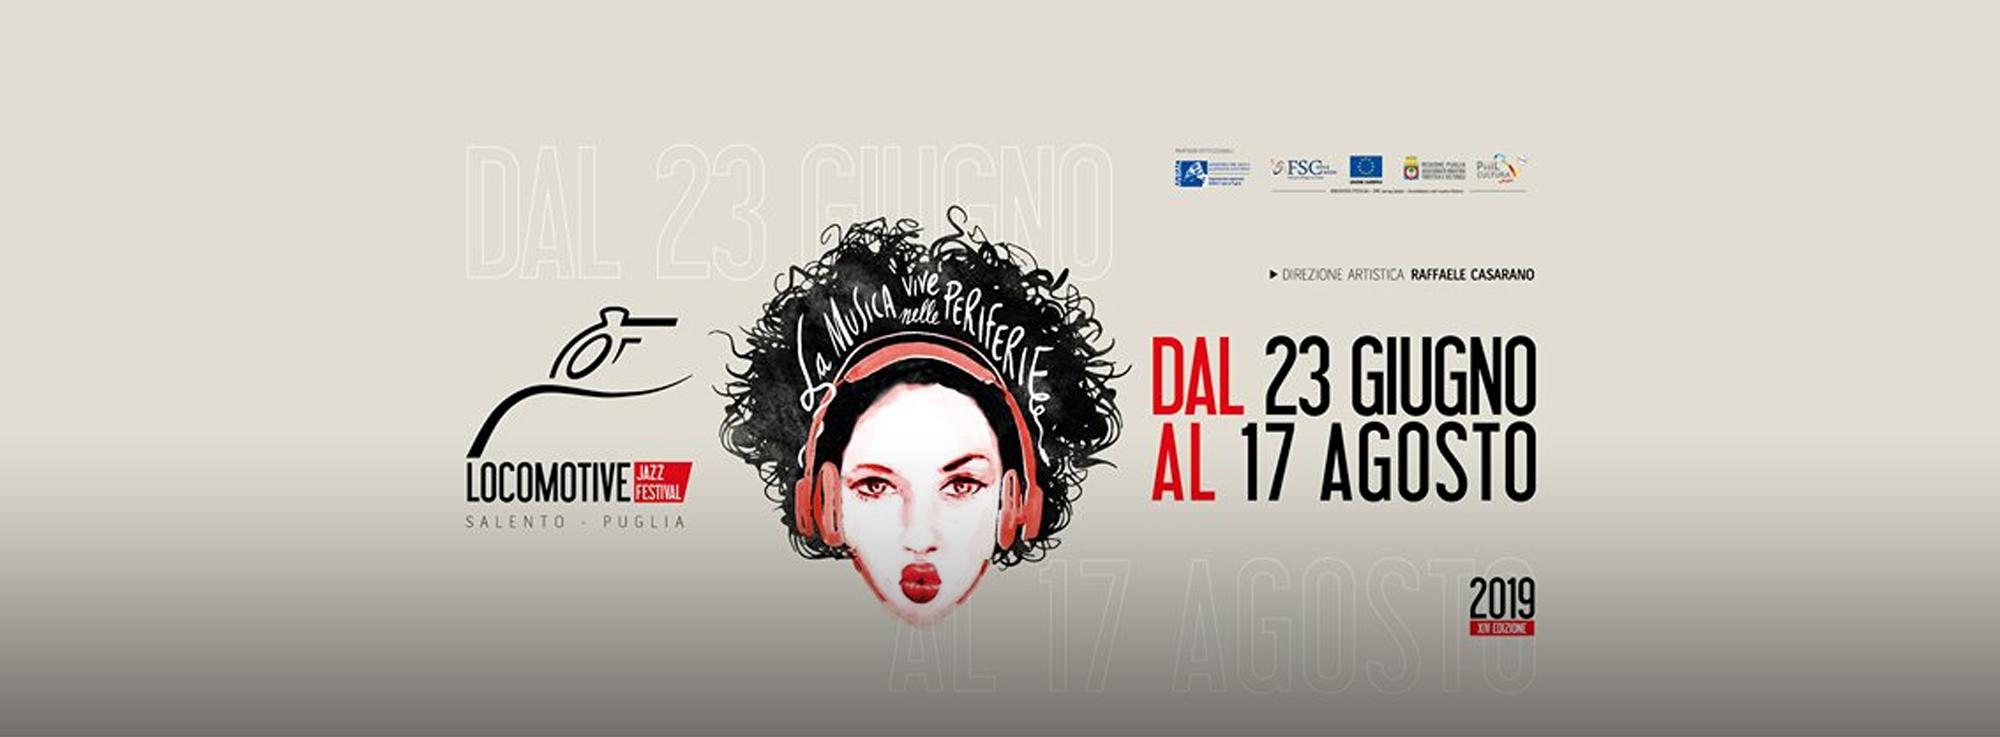 Brindisi: Locomotive Jazz Festival